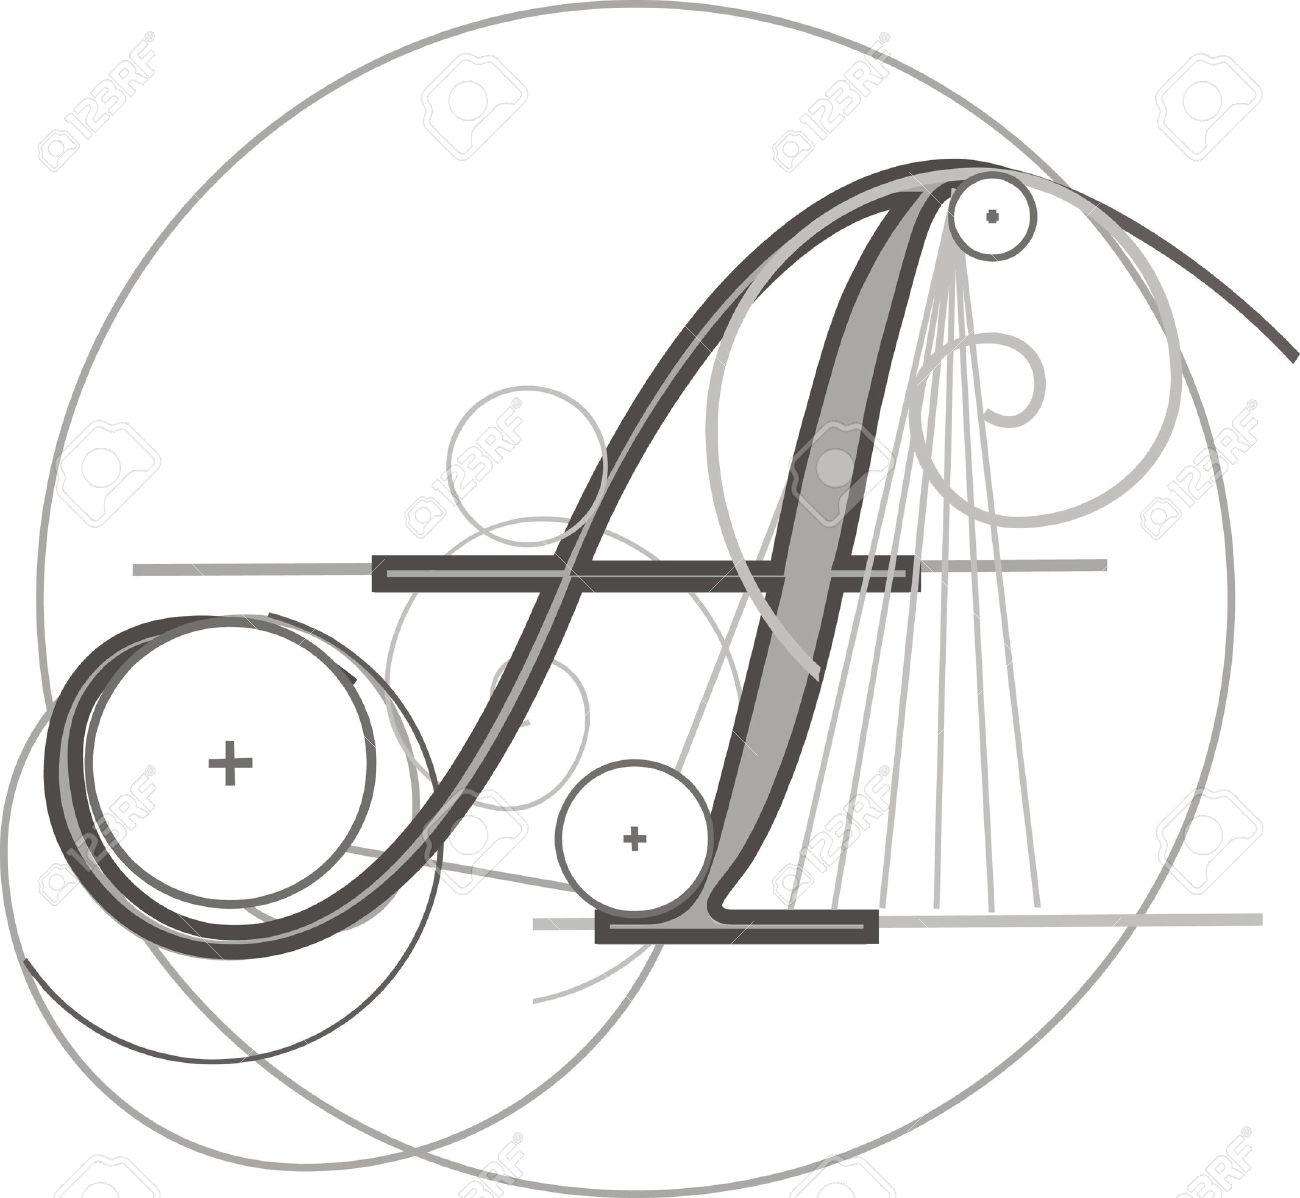 Decorative architectural letter for design Stock Vector - 8118334